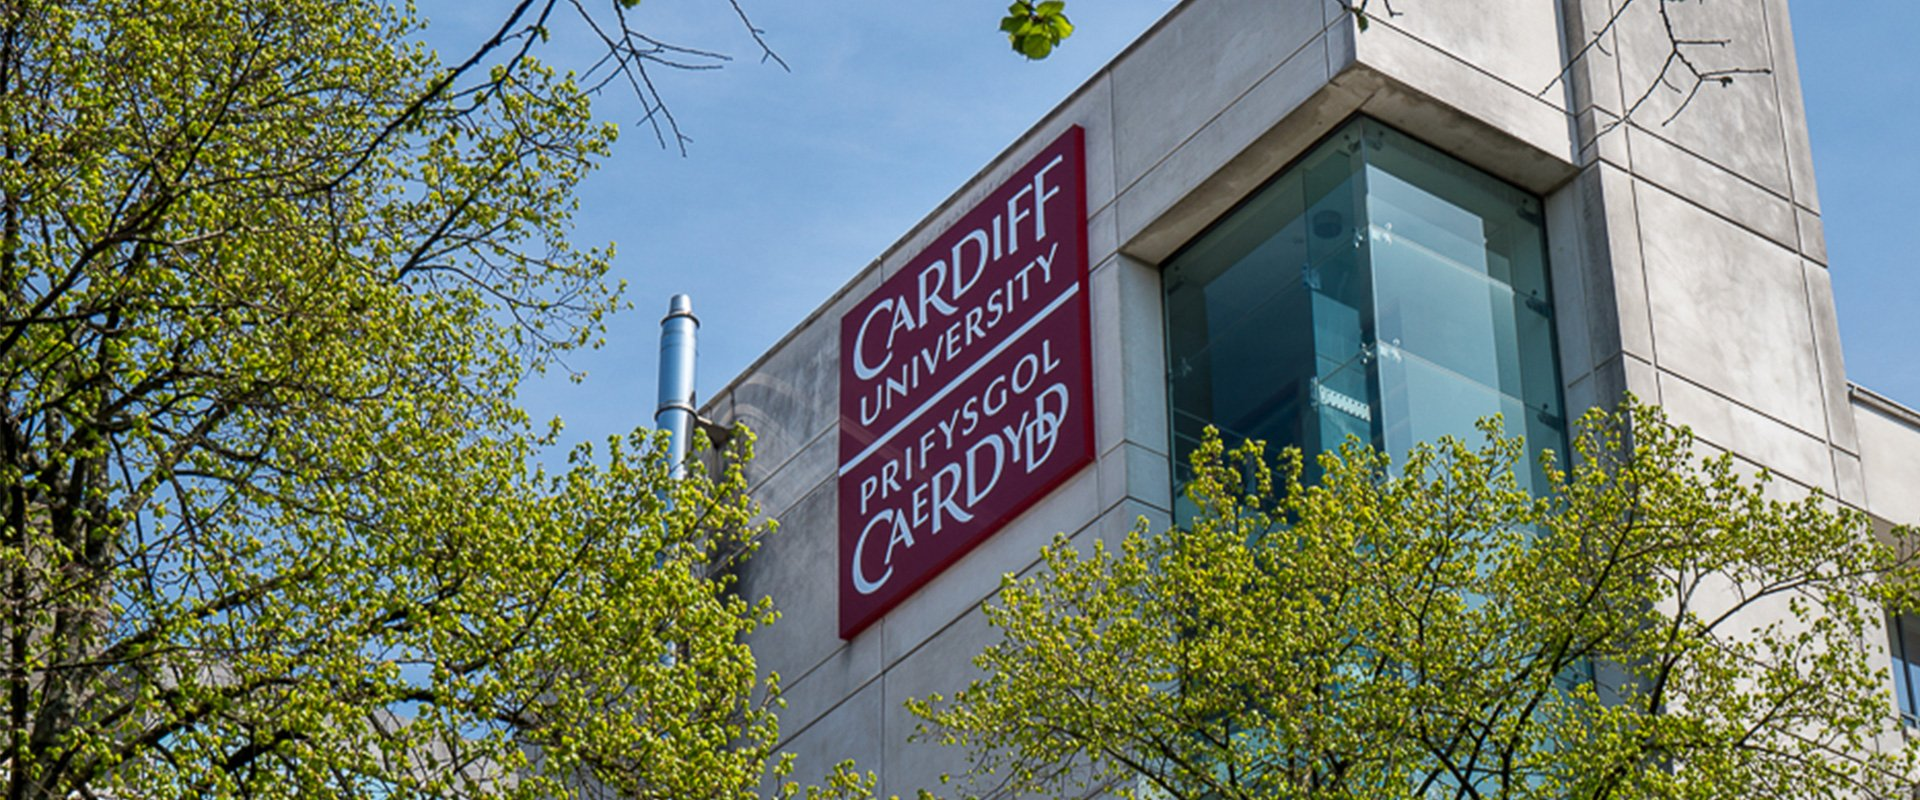 Cardiff University building logo branding